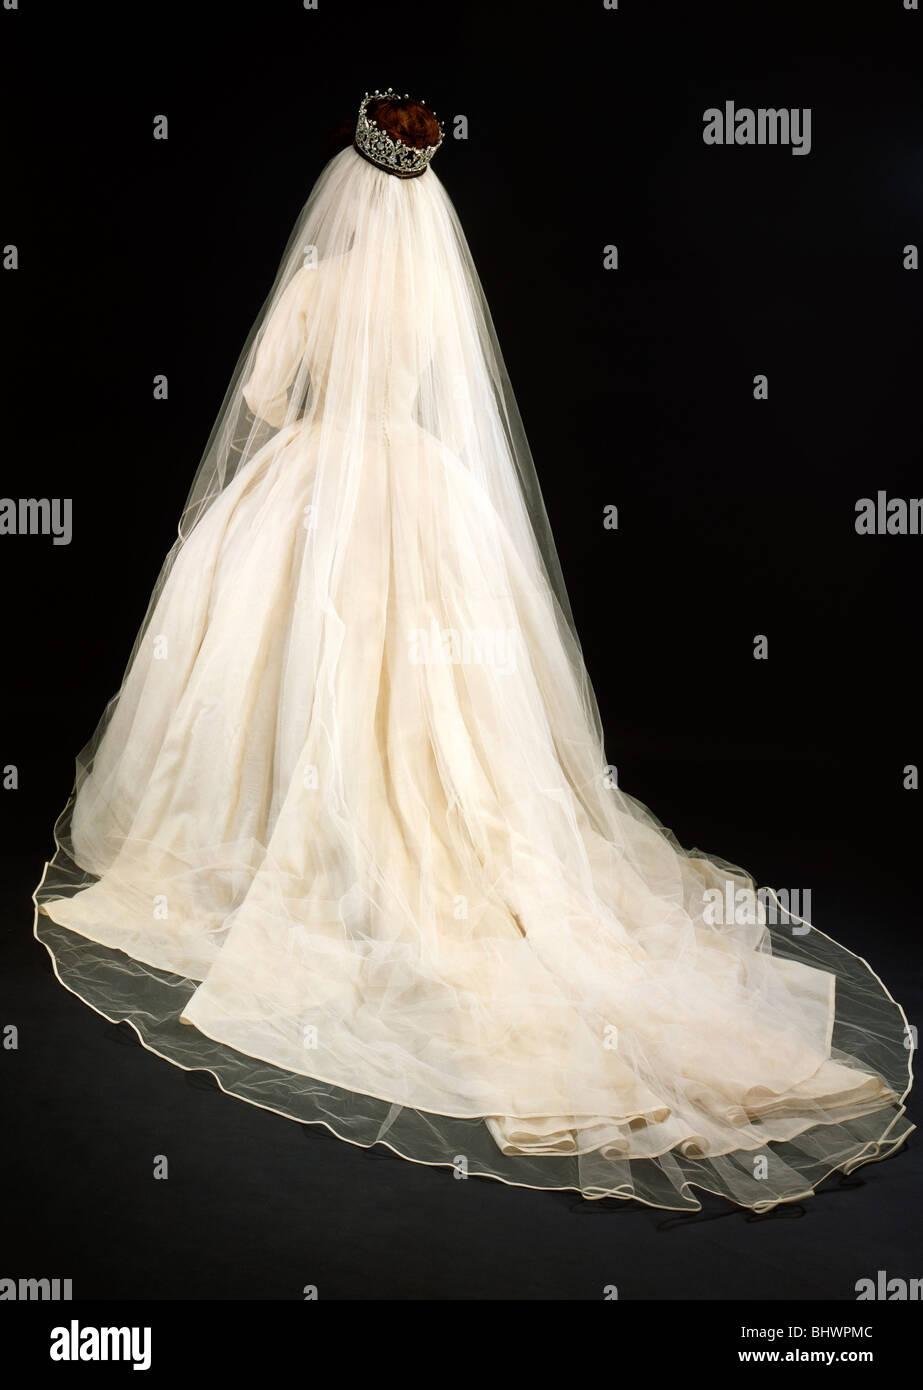 Princess Margaret S Wedding Dress Rear View 1981 Artist